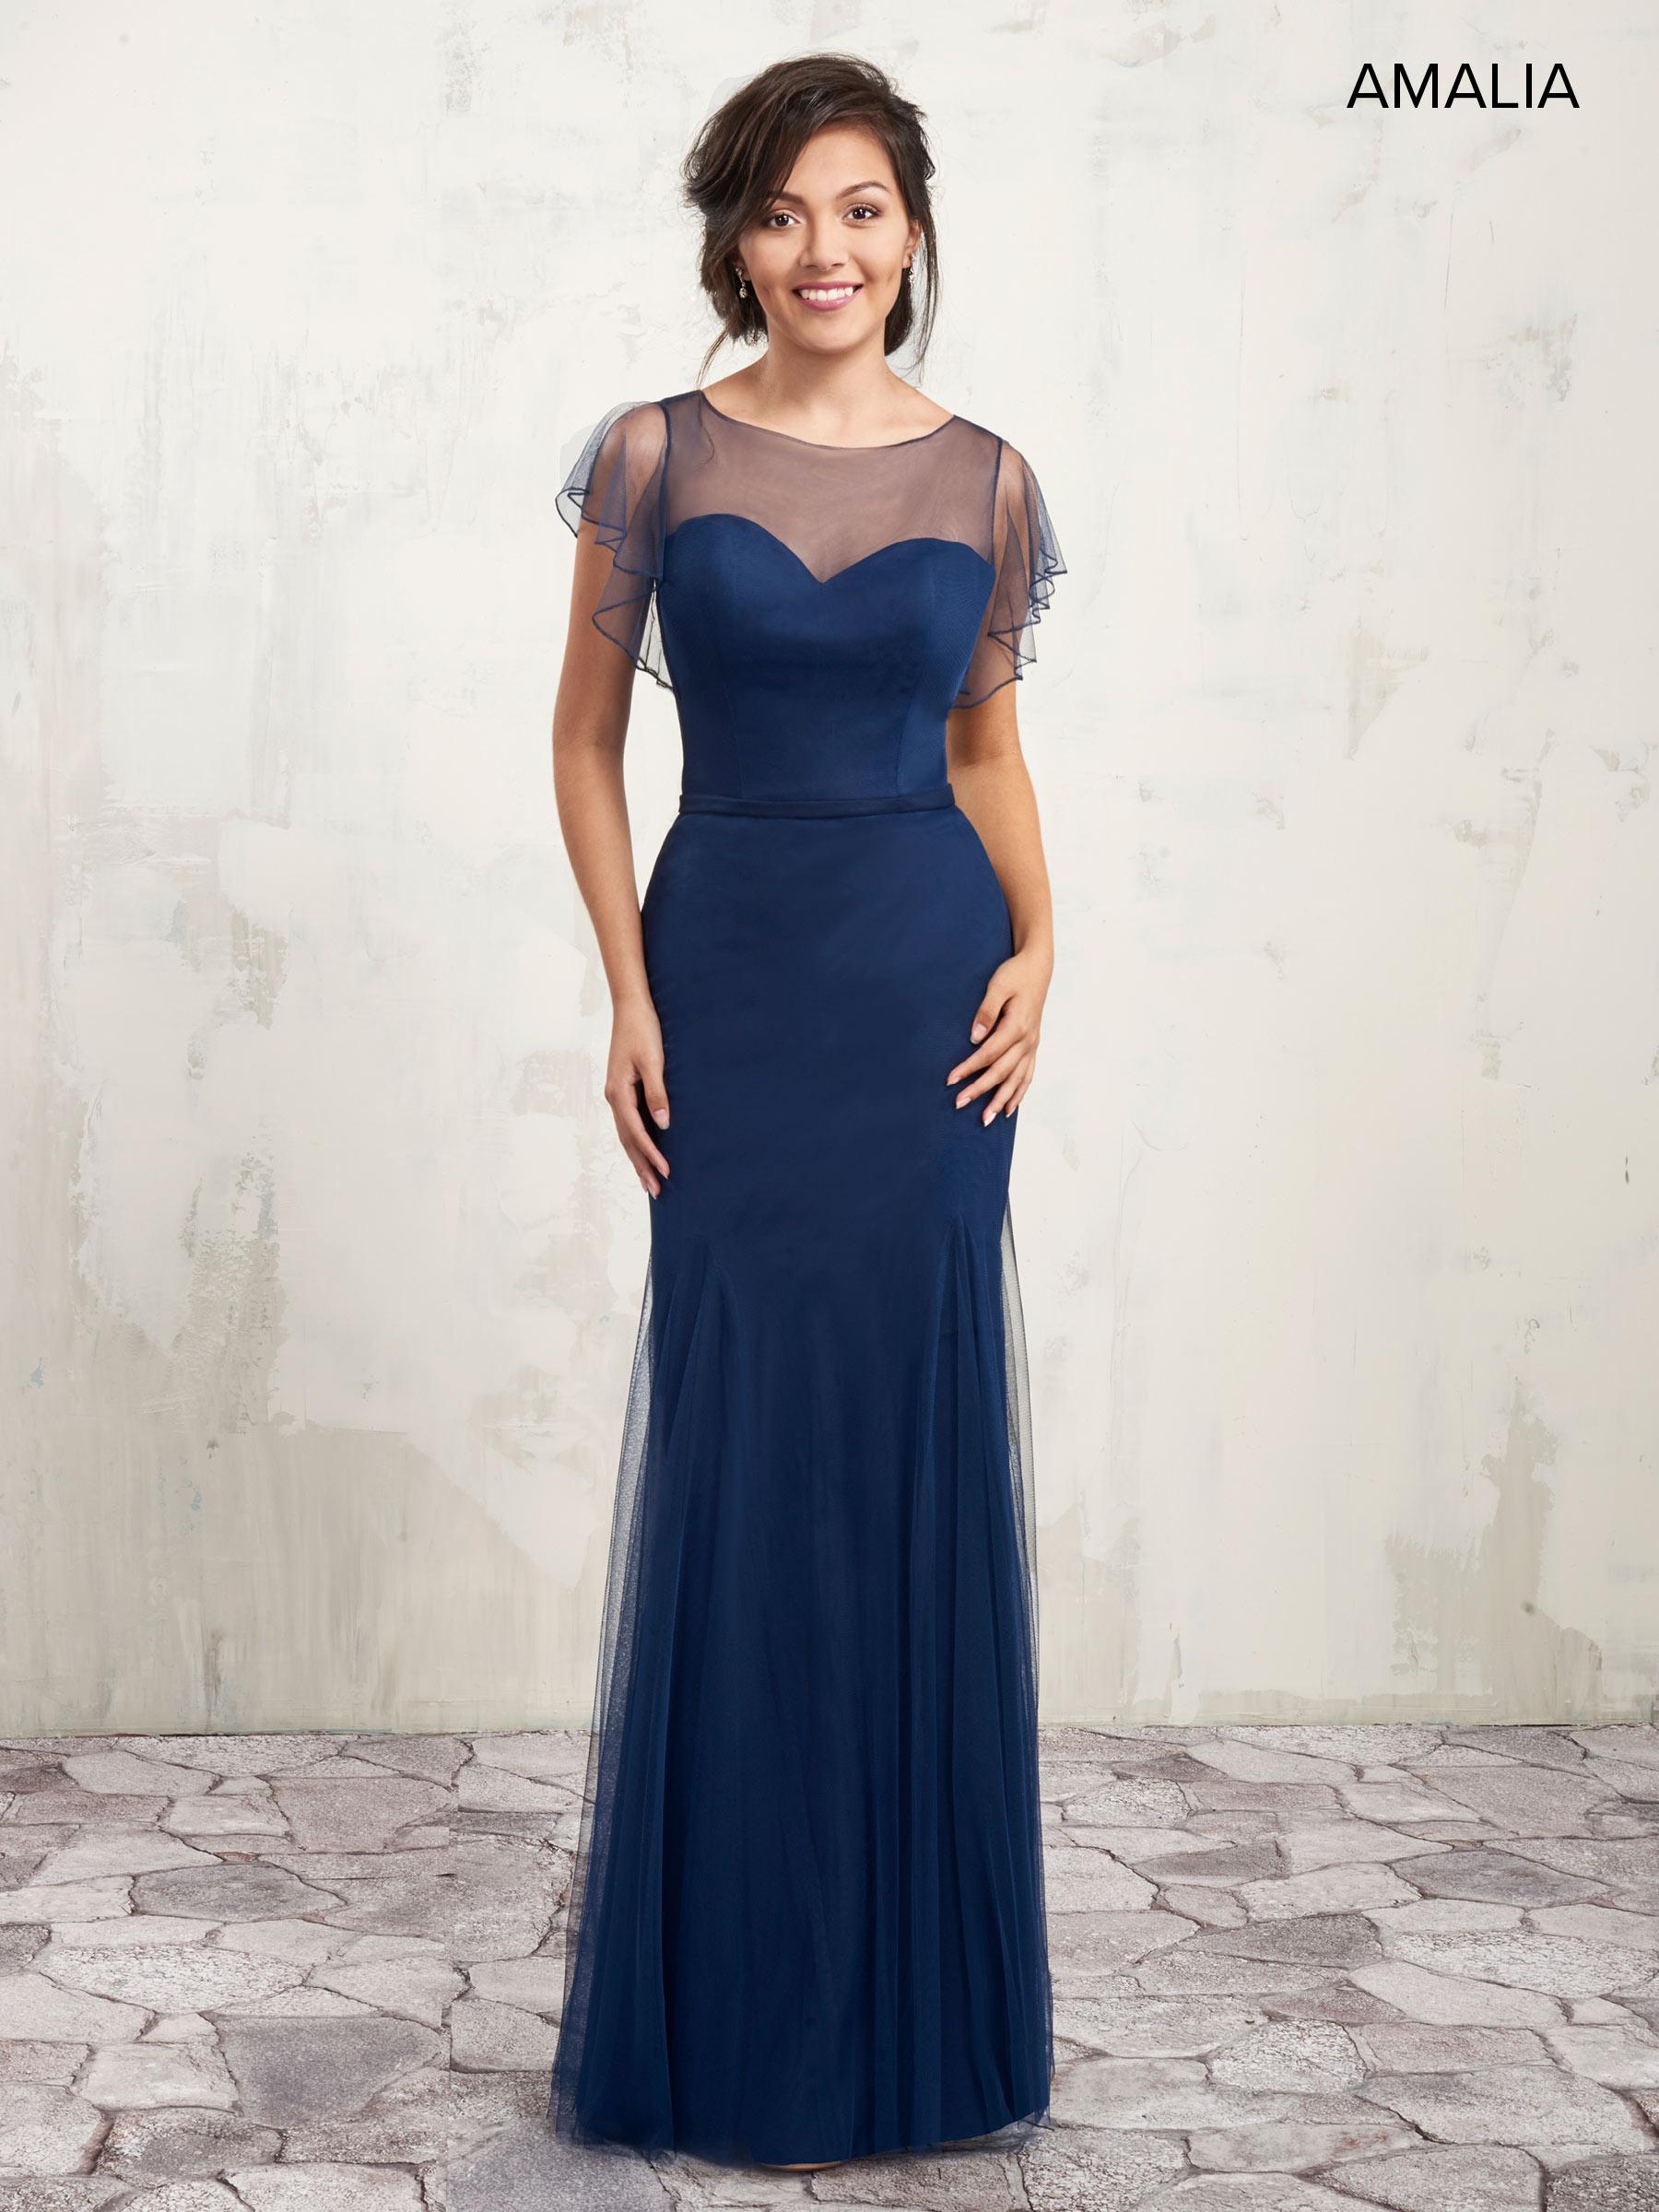 Amalia Bridesmaid Dresses | Amalia | Style - MB7002